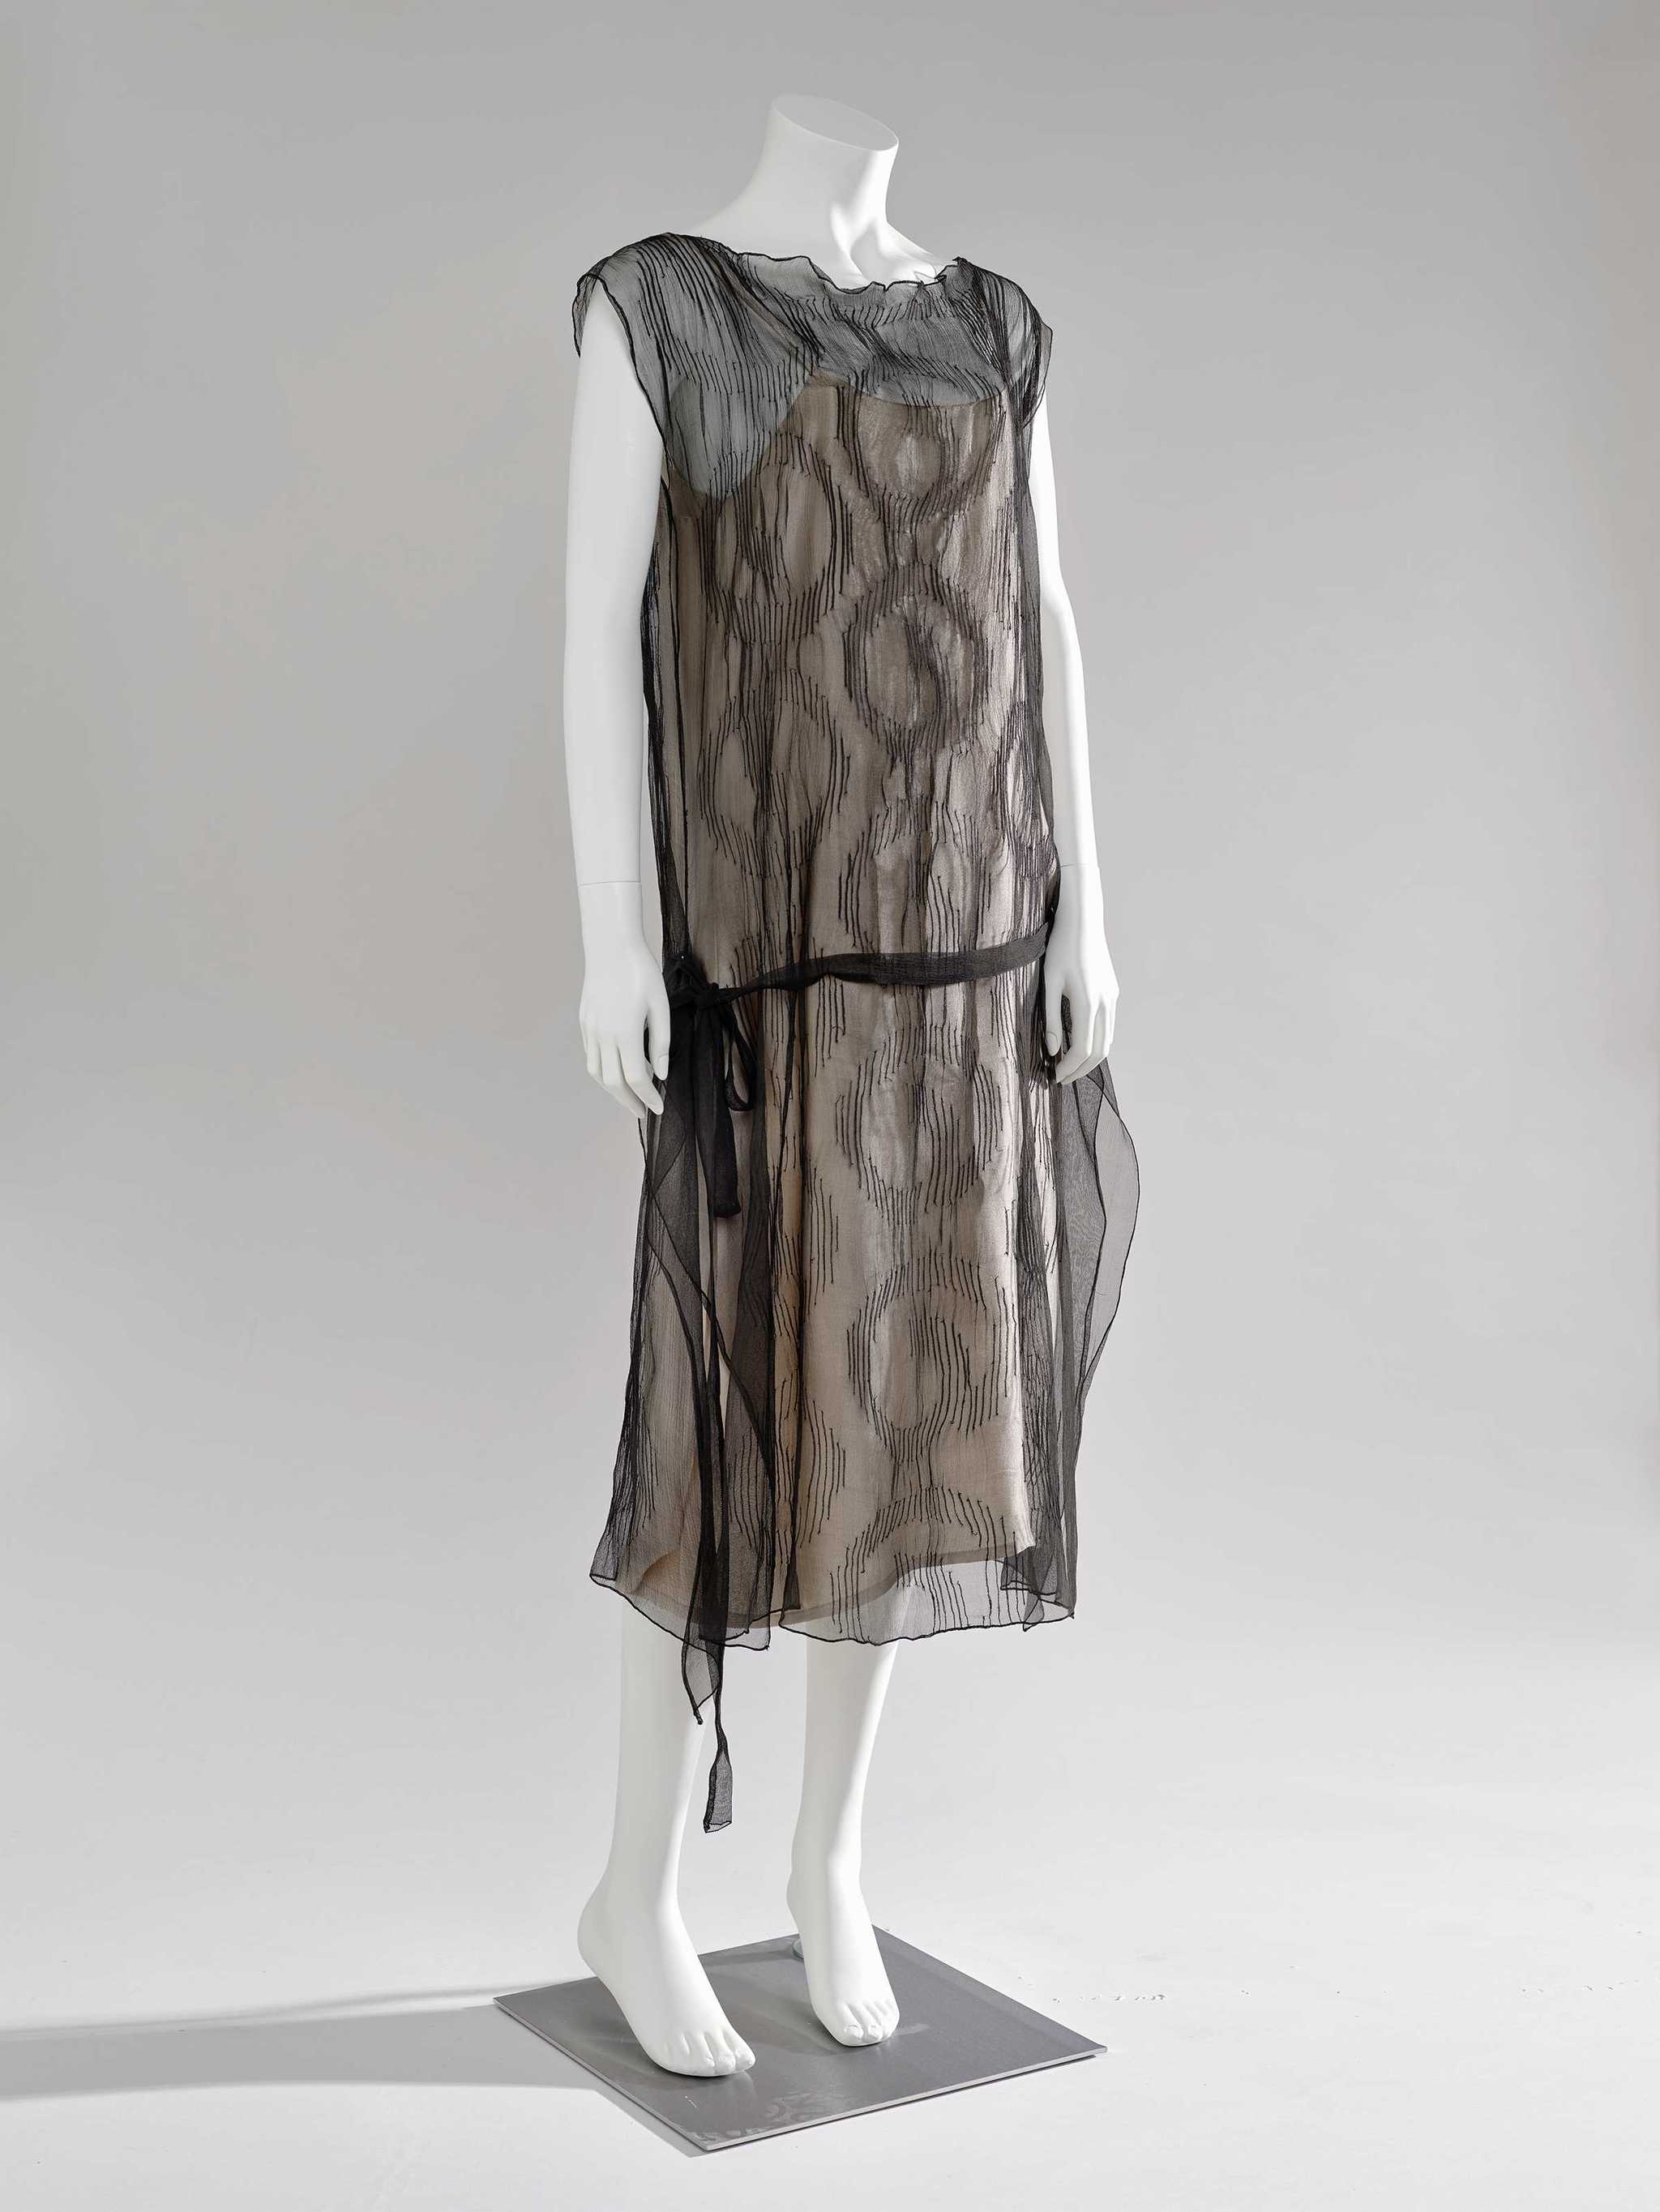 Madeleine Vionnet. Vestido de cóctel, ca. 1928